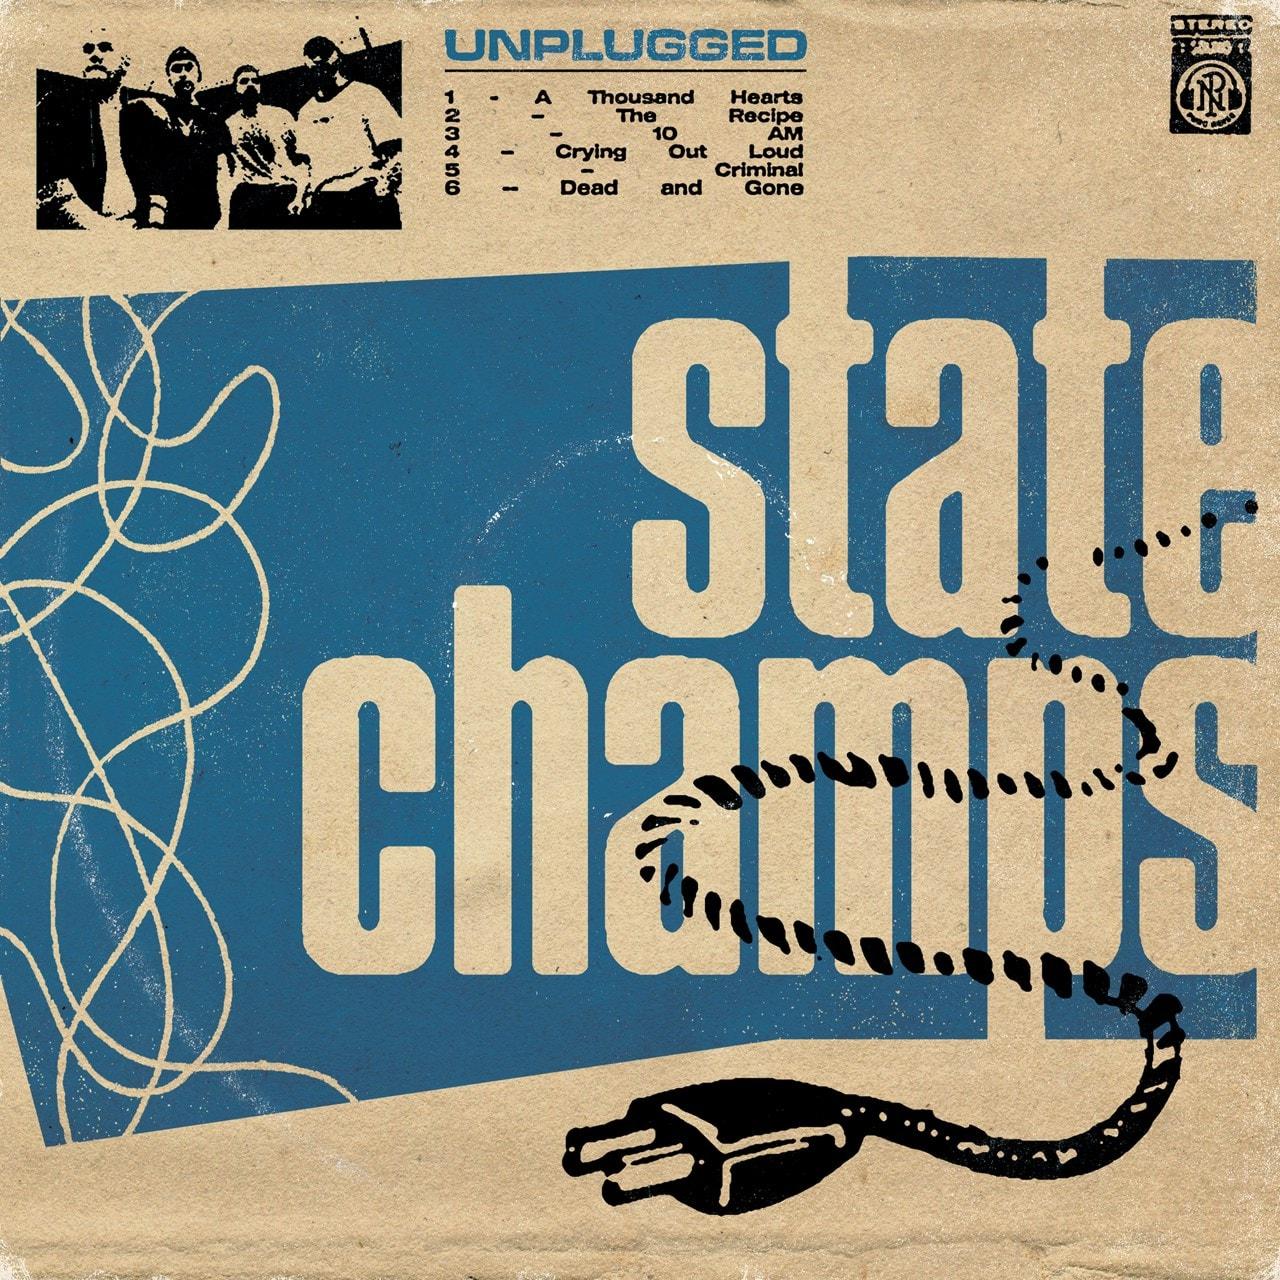 Unplugged - 1